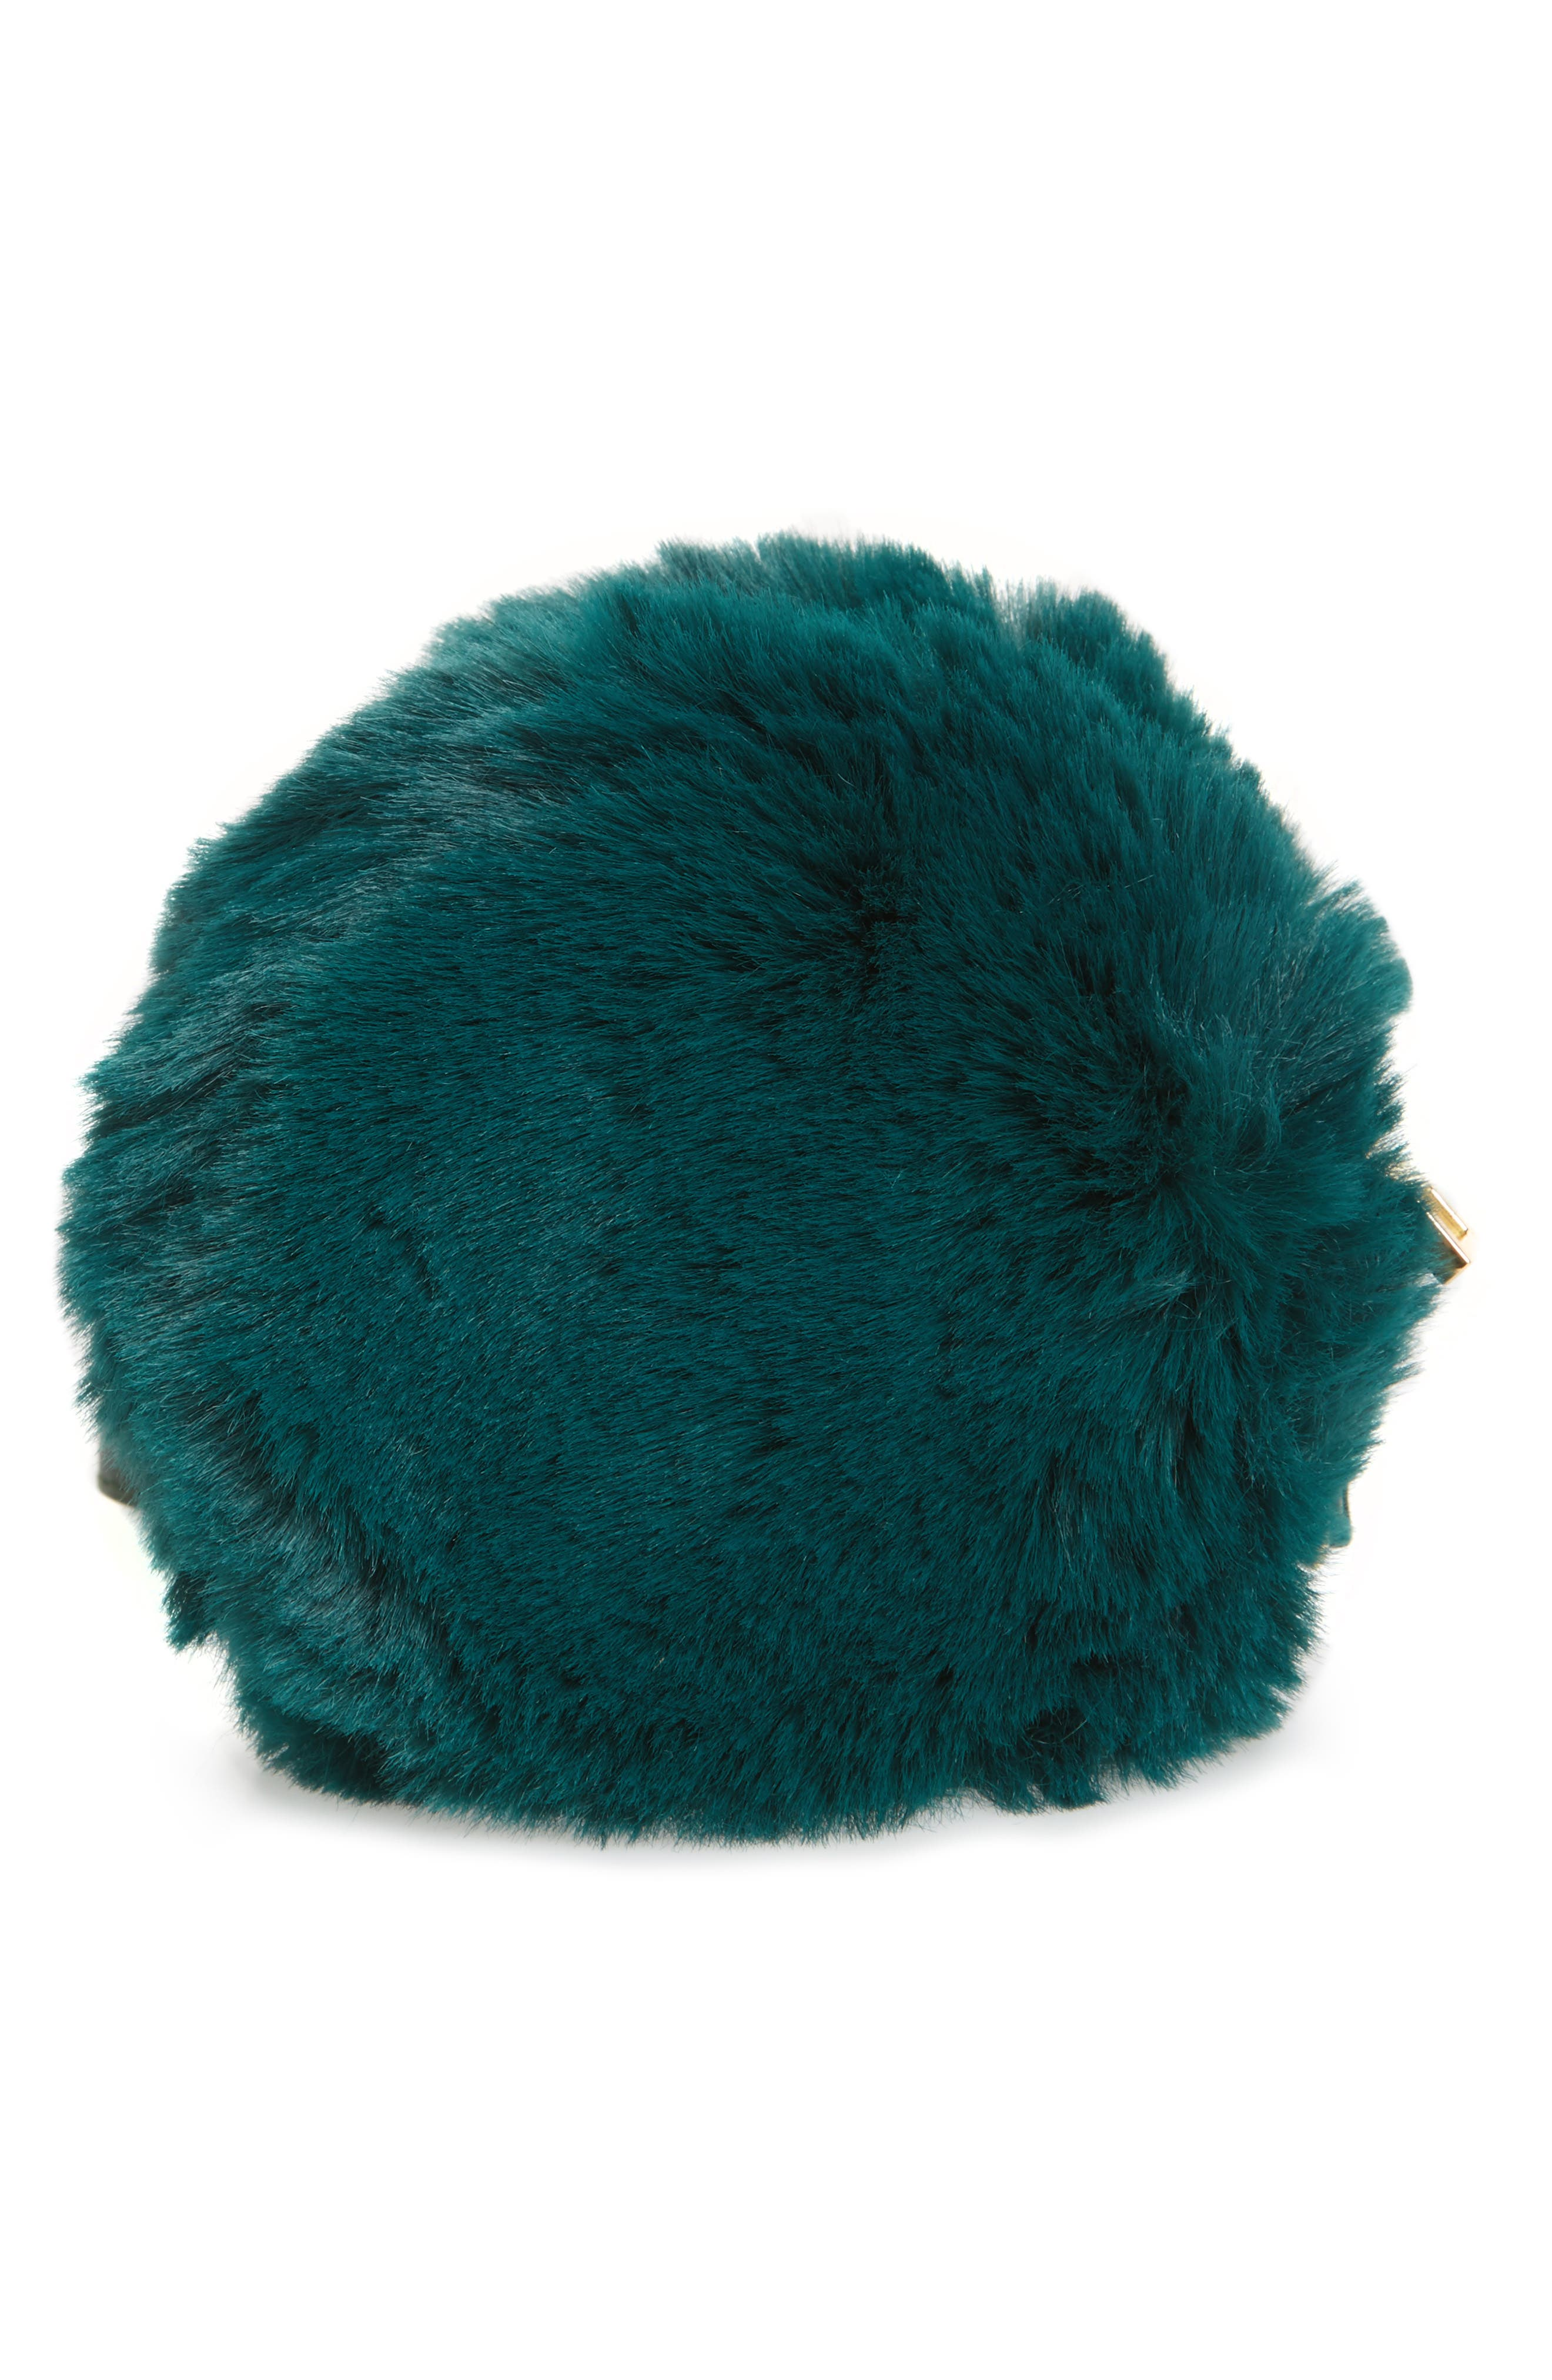 Macaron Faux Fur Wristlet,                             Alternate thumbnail 3, color,                             300